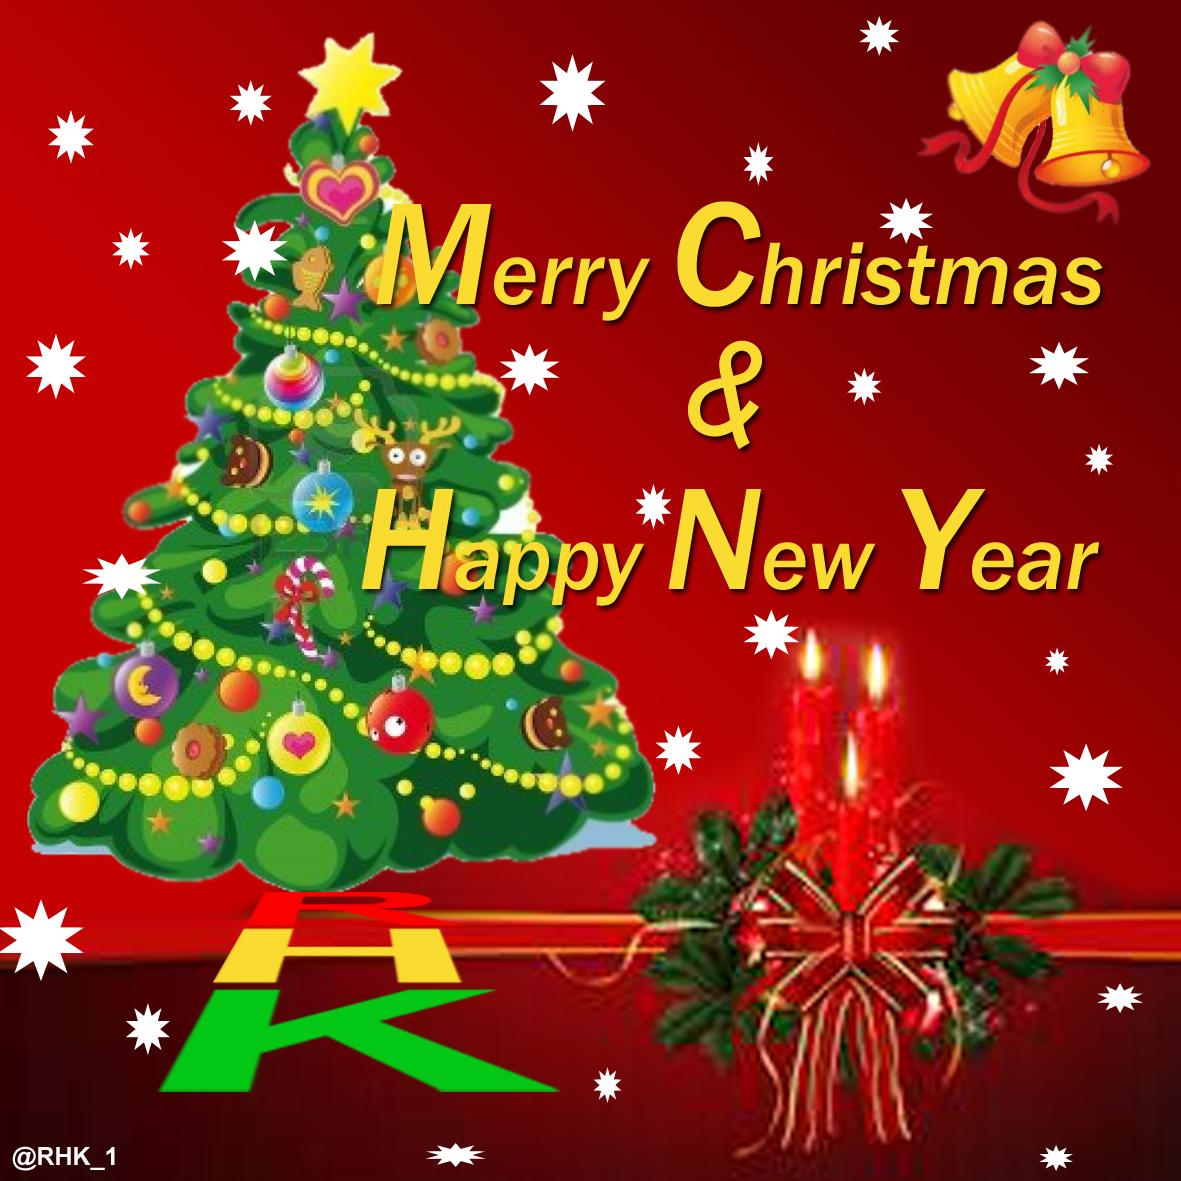 Koleksi Dp Bbm Merry Christmas 2017 Terbaru Jurugan Info